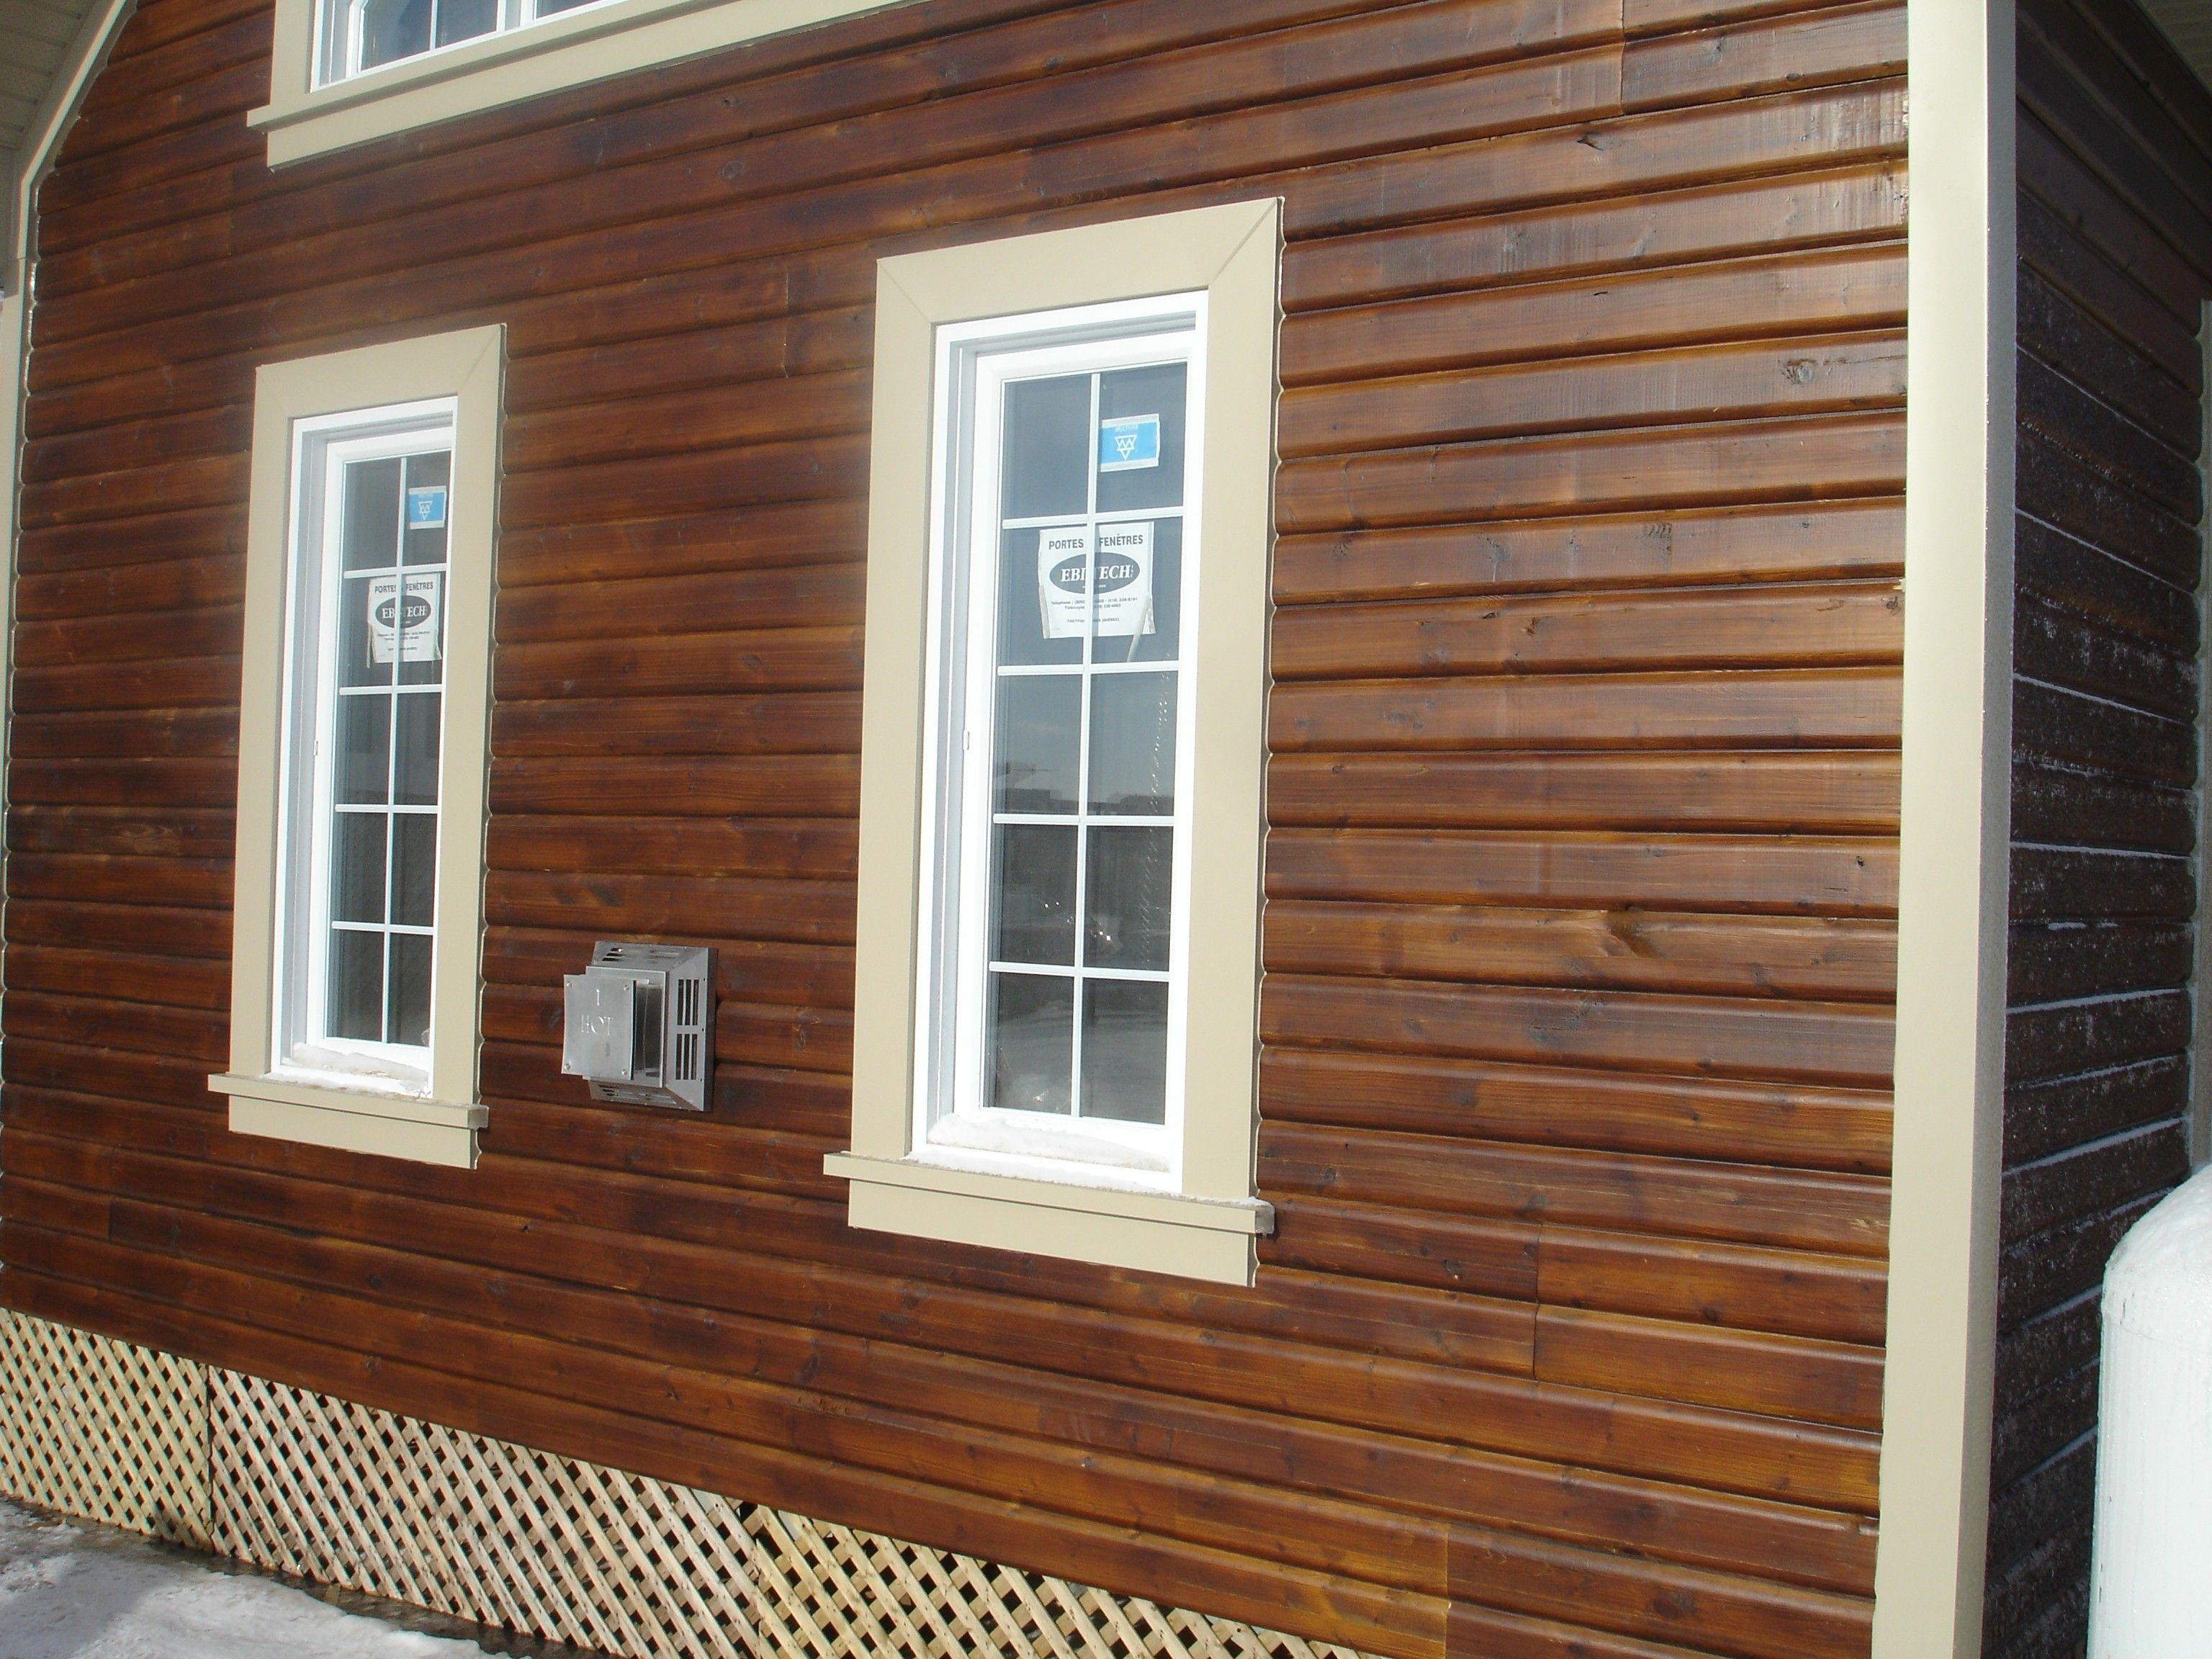 Lamwall Natural Exterior And Interior Wood Siding Vinyl Siding Exterior House Remodel House Siding